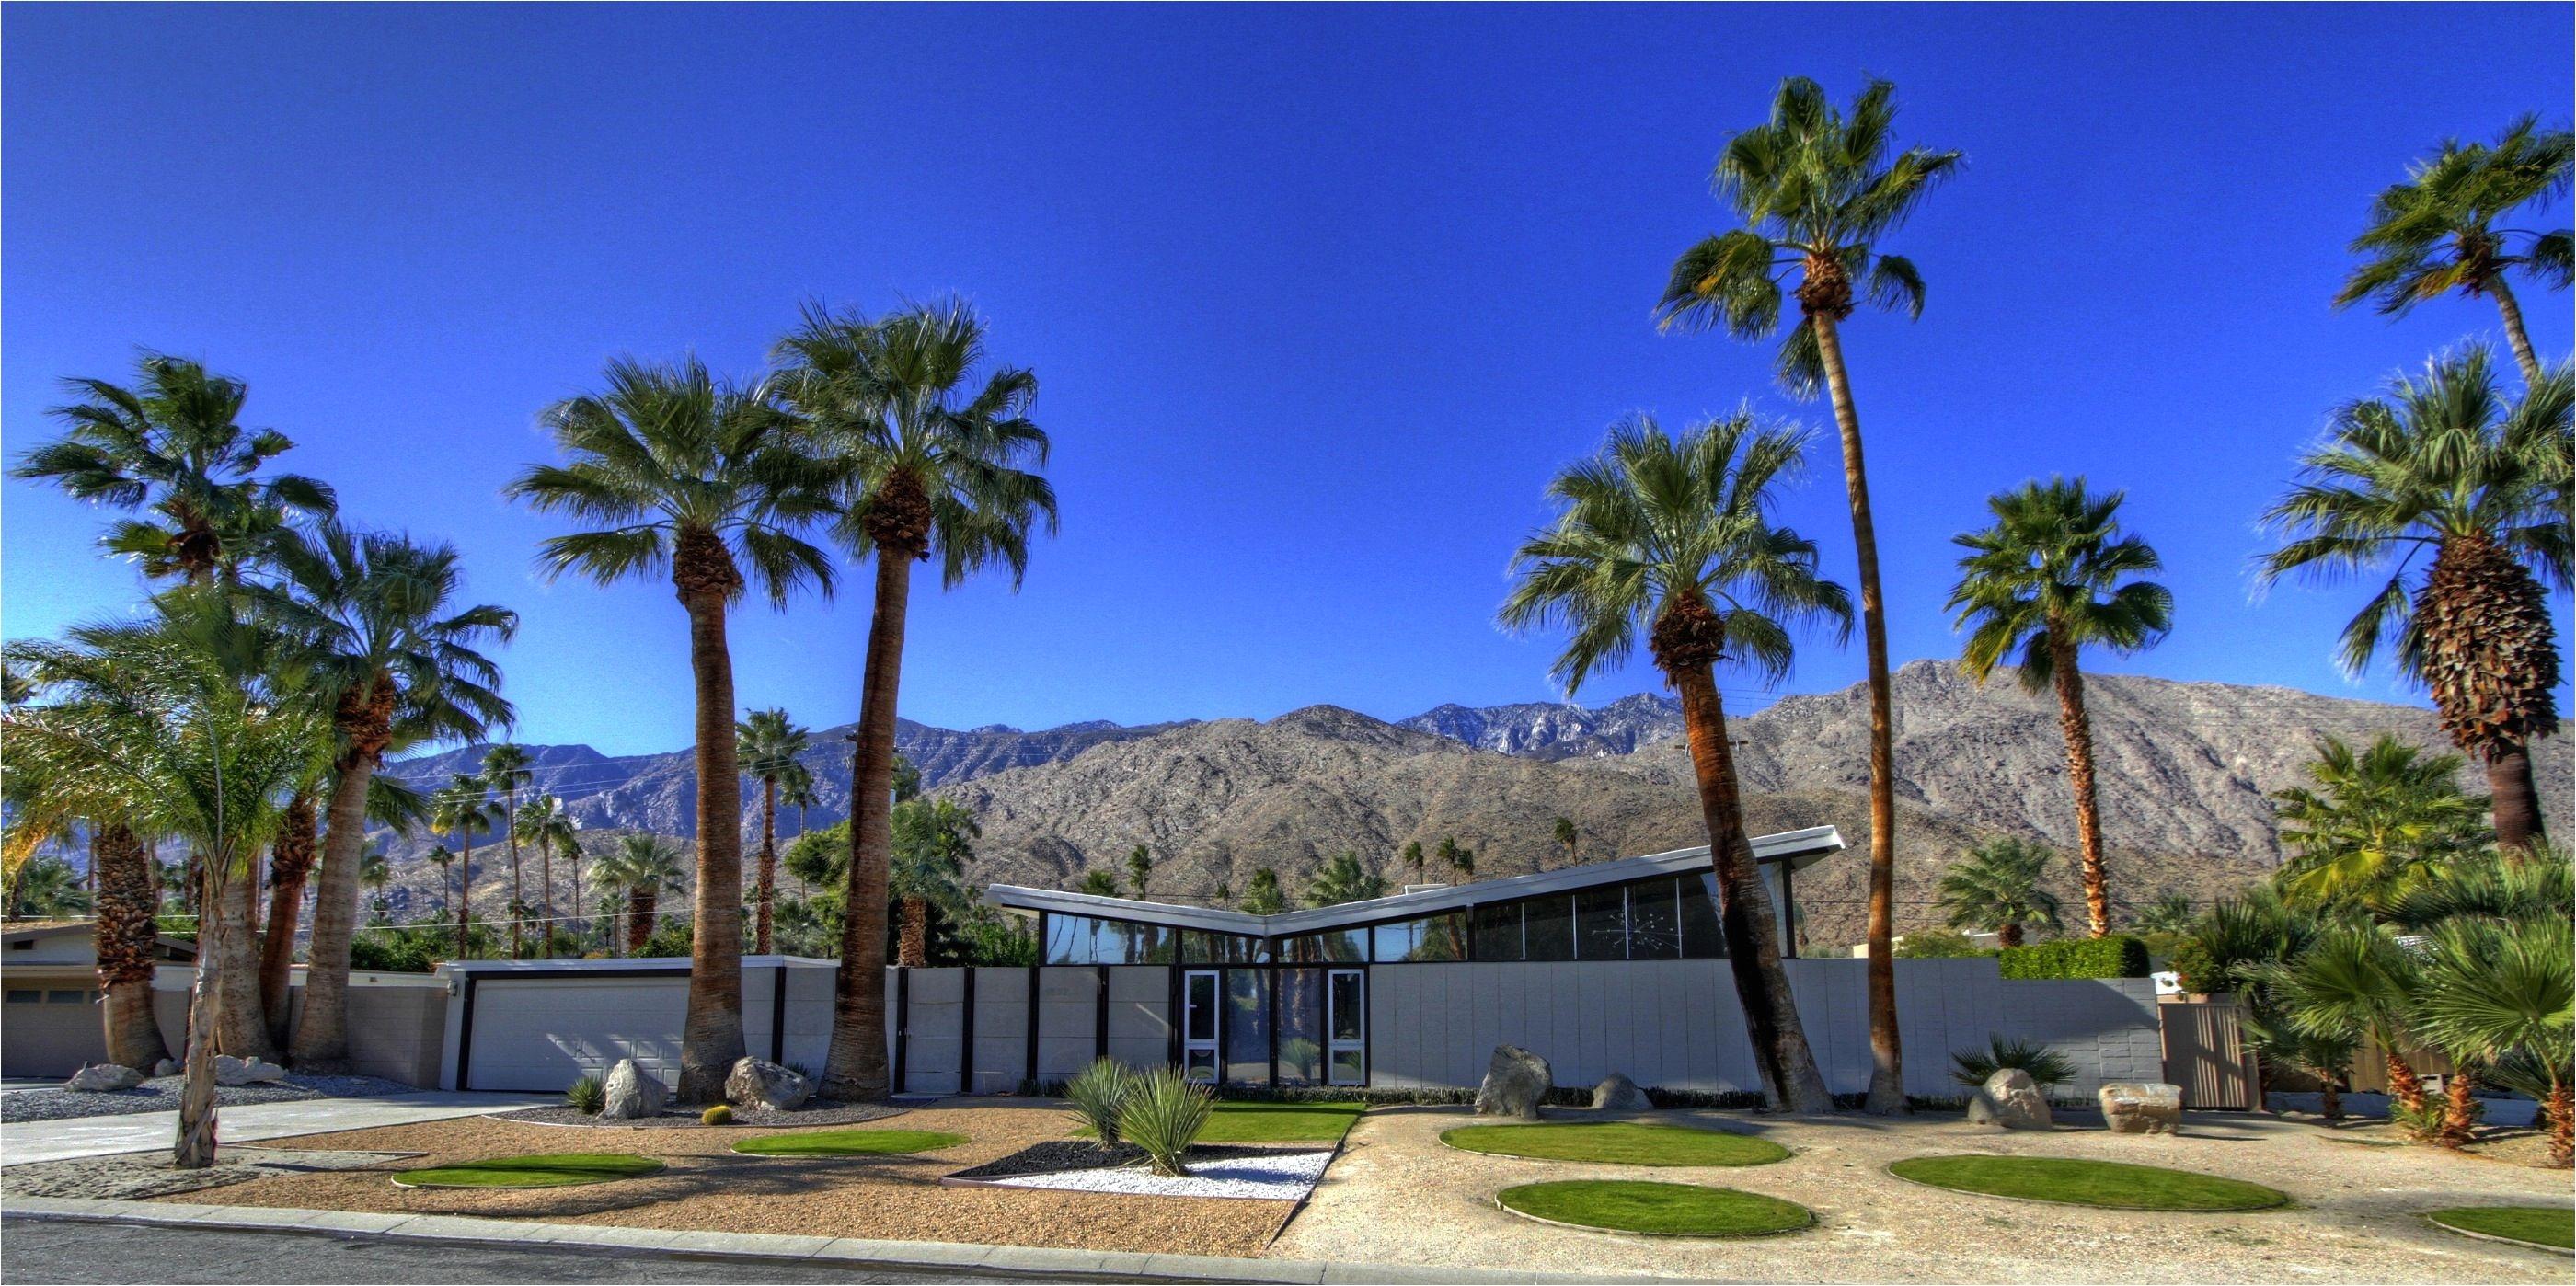 palm springs desert modern architecture